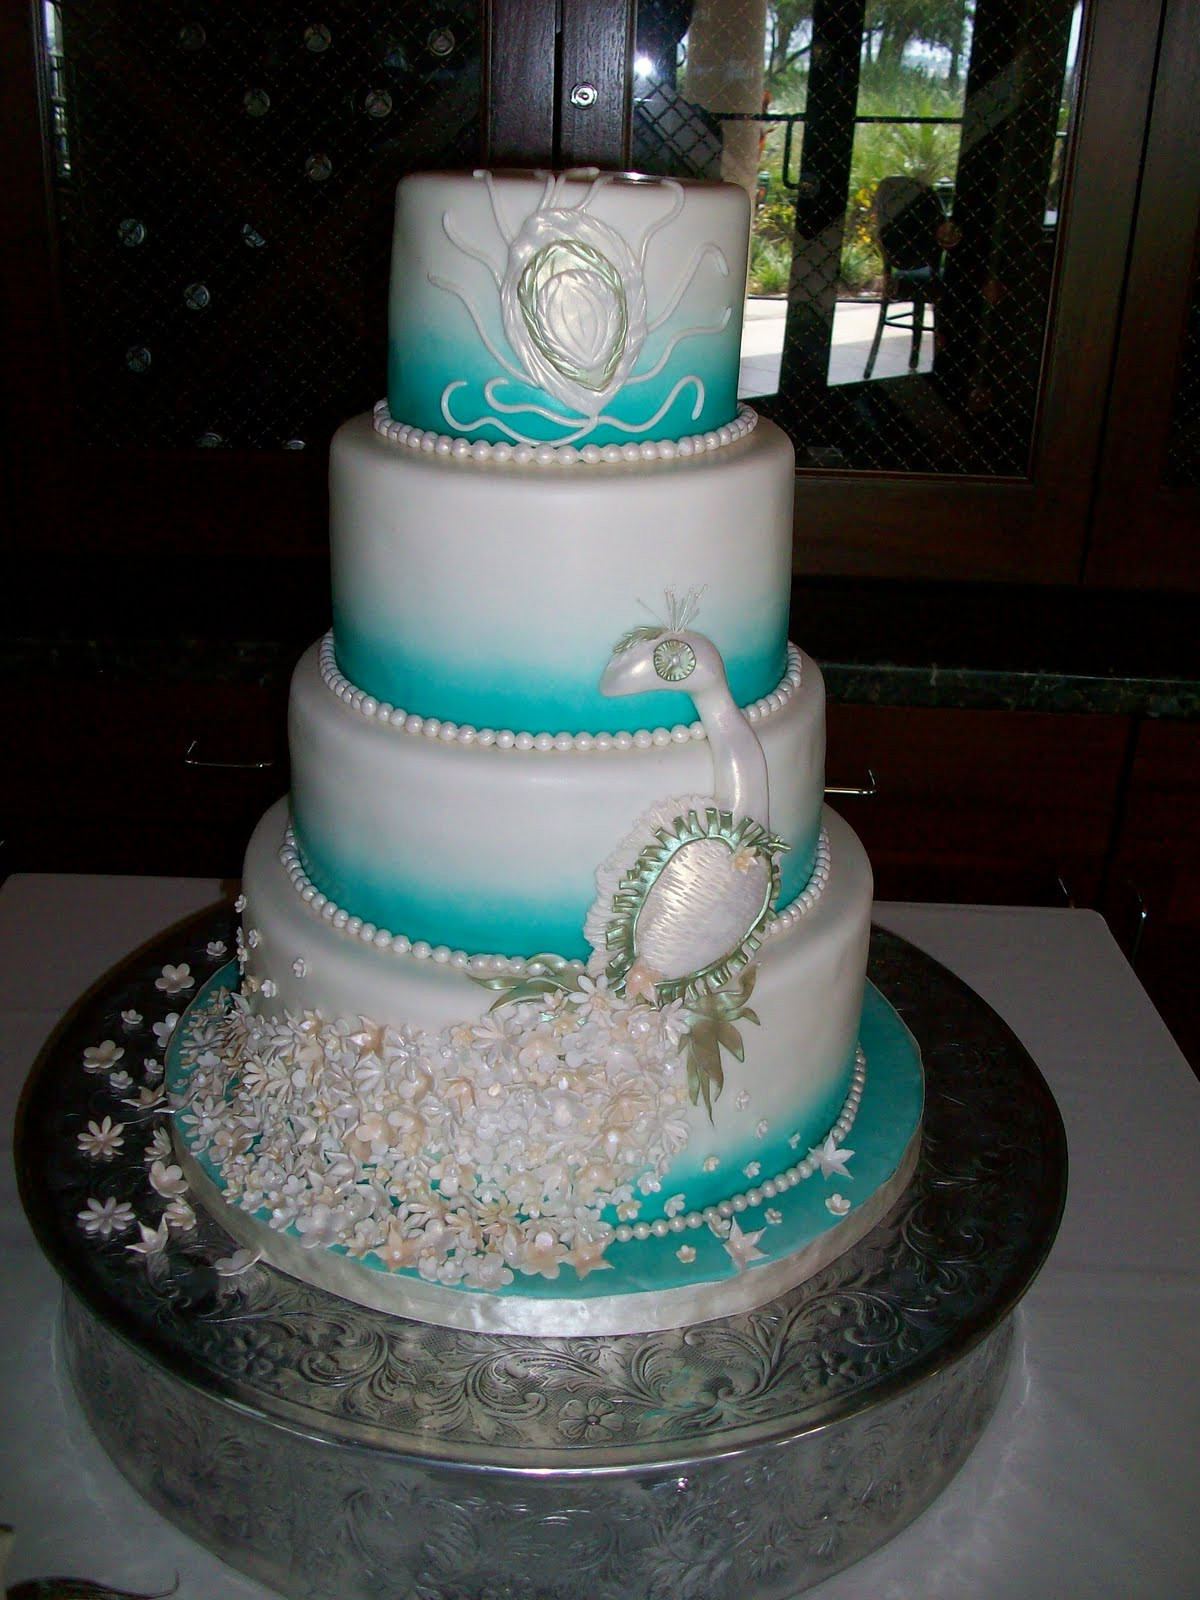 Themed Wedding Cakes  PEACOCK THEMED WEDDING CAKE